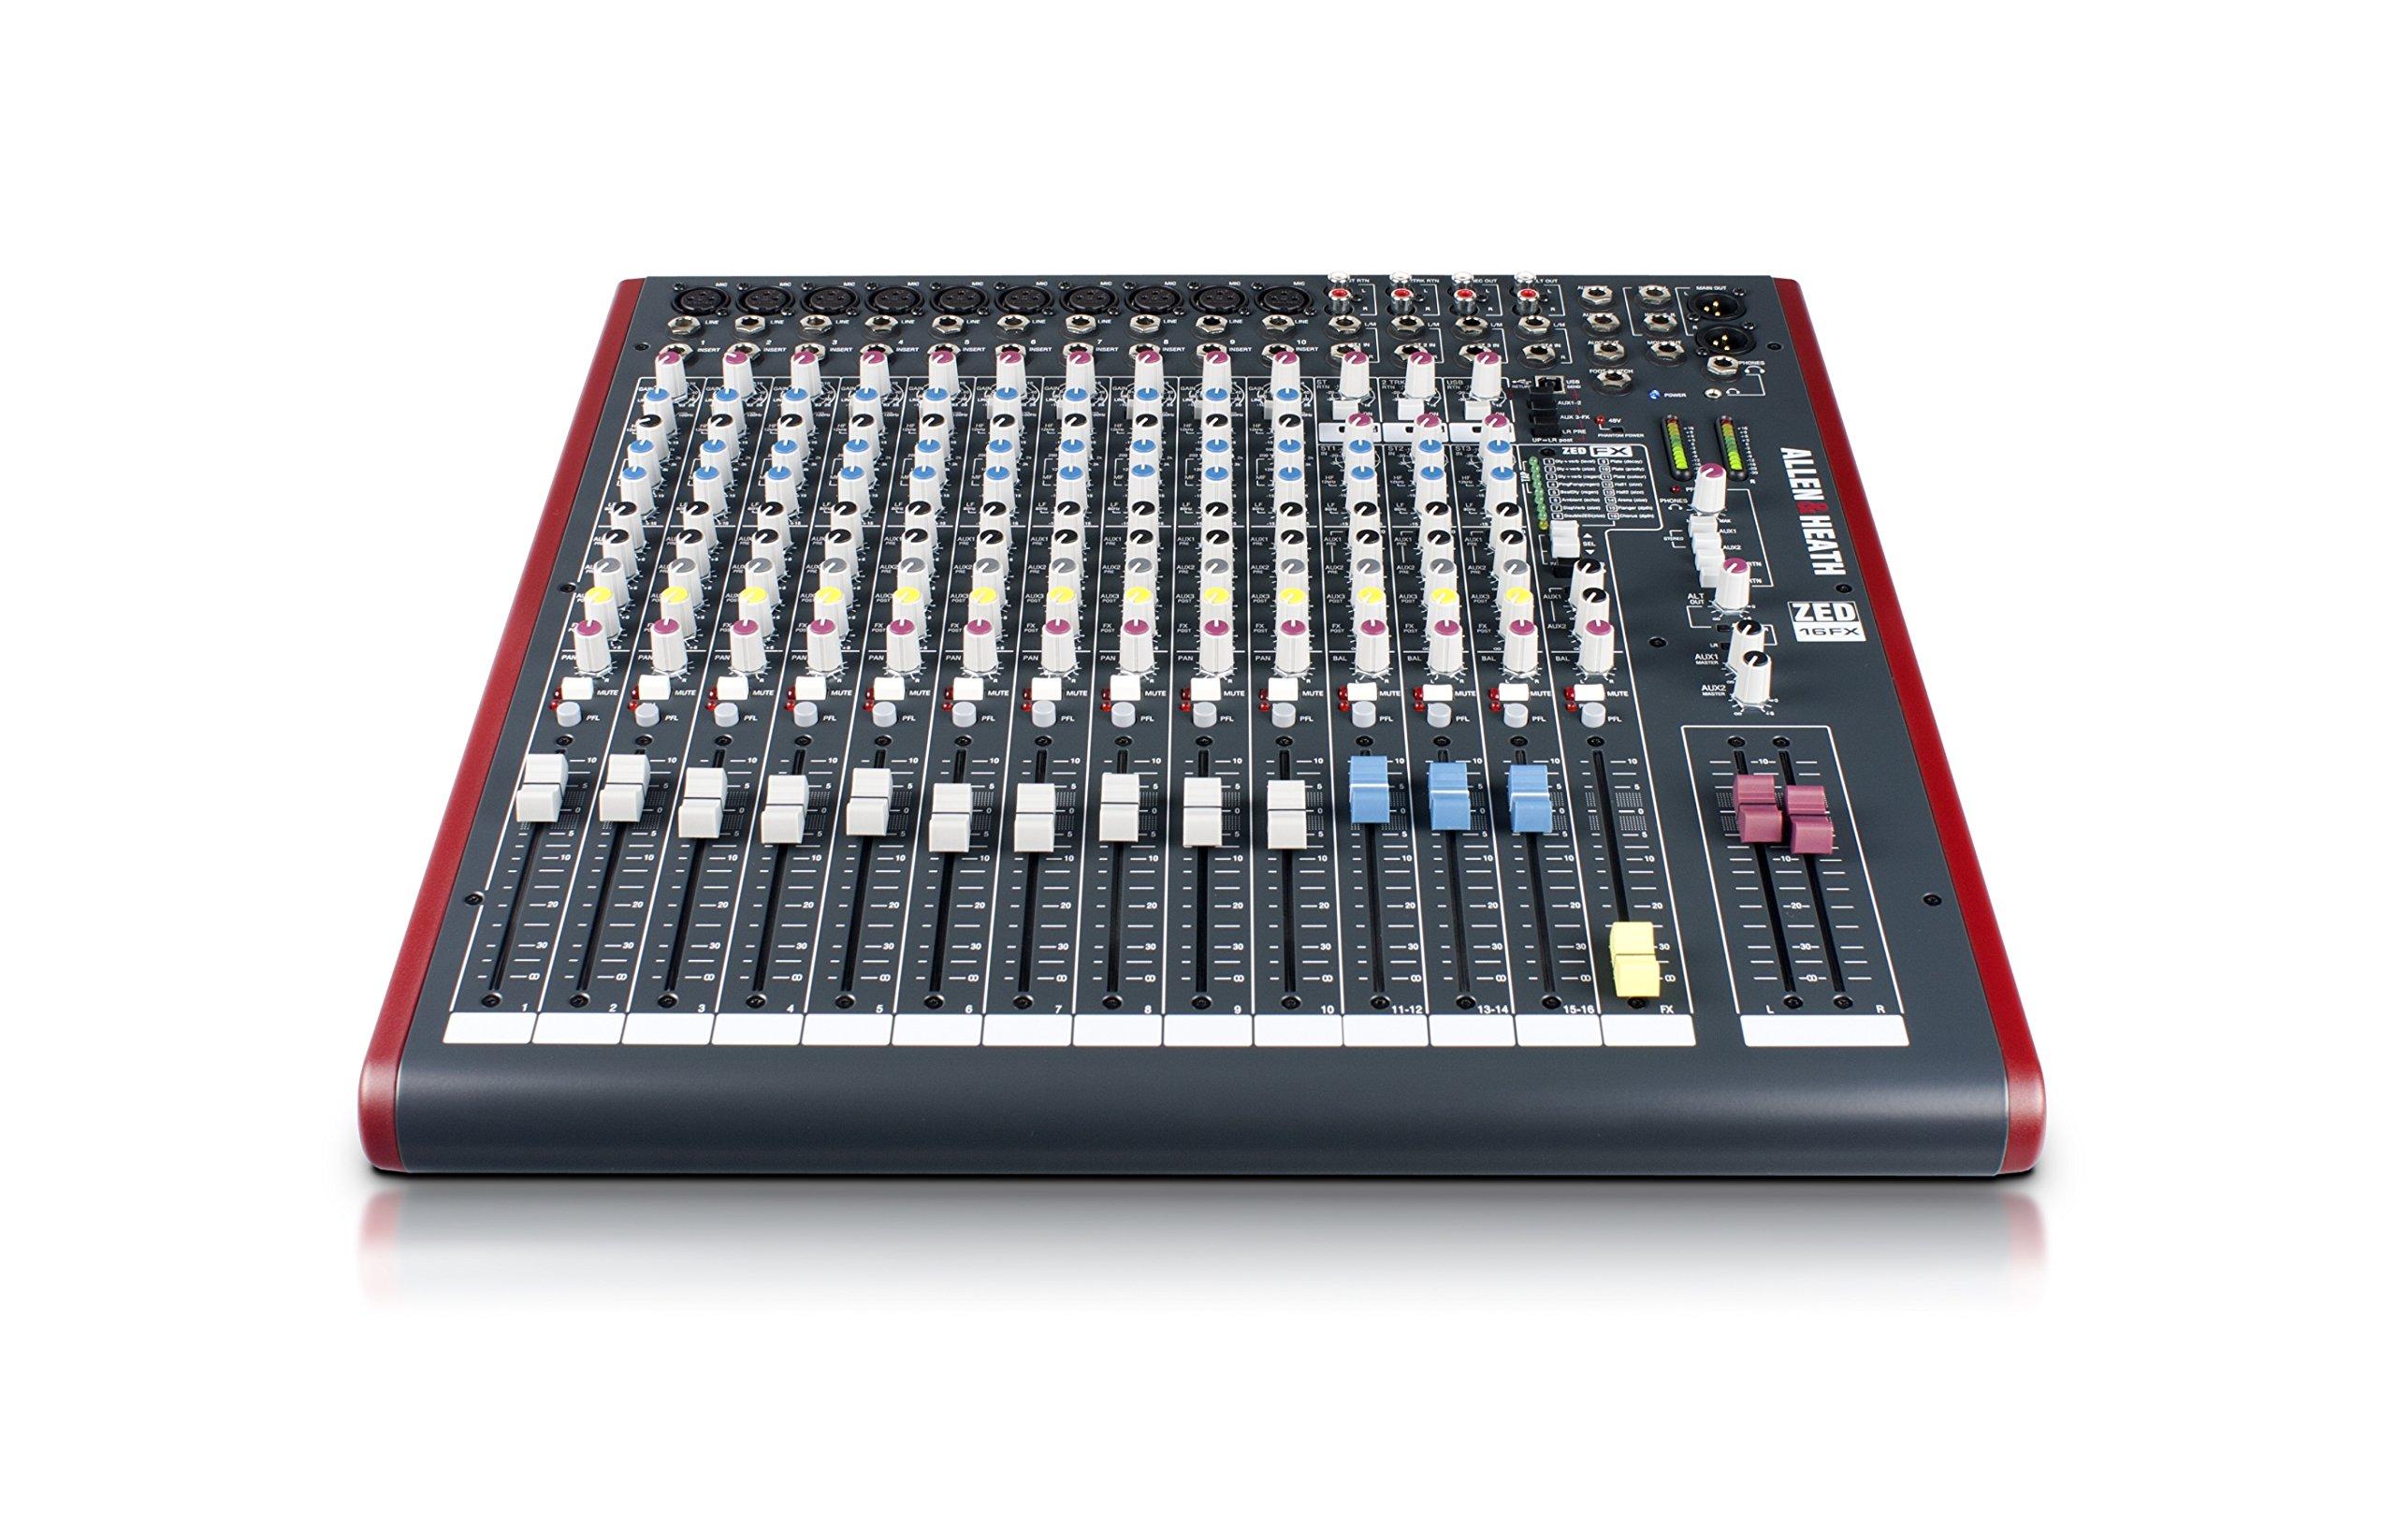 Allen & Heath ZED-16FX 16-Channel Multi-Purpose USB Mixer with FX for Live Sound and Recording by Allen & Heath (Image #3)